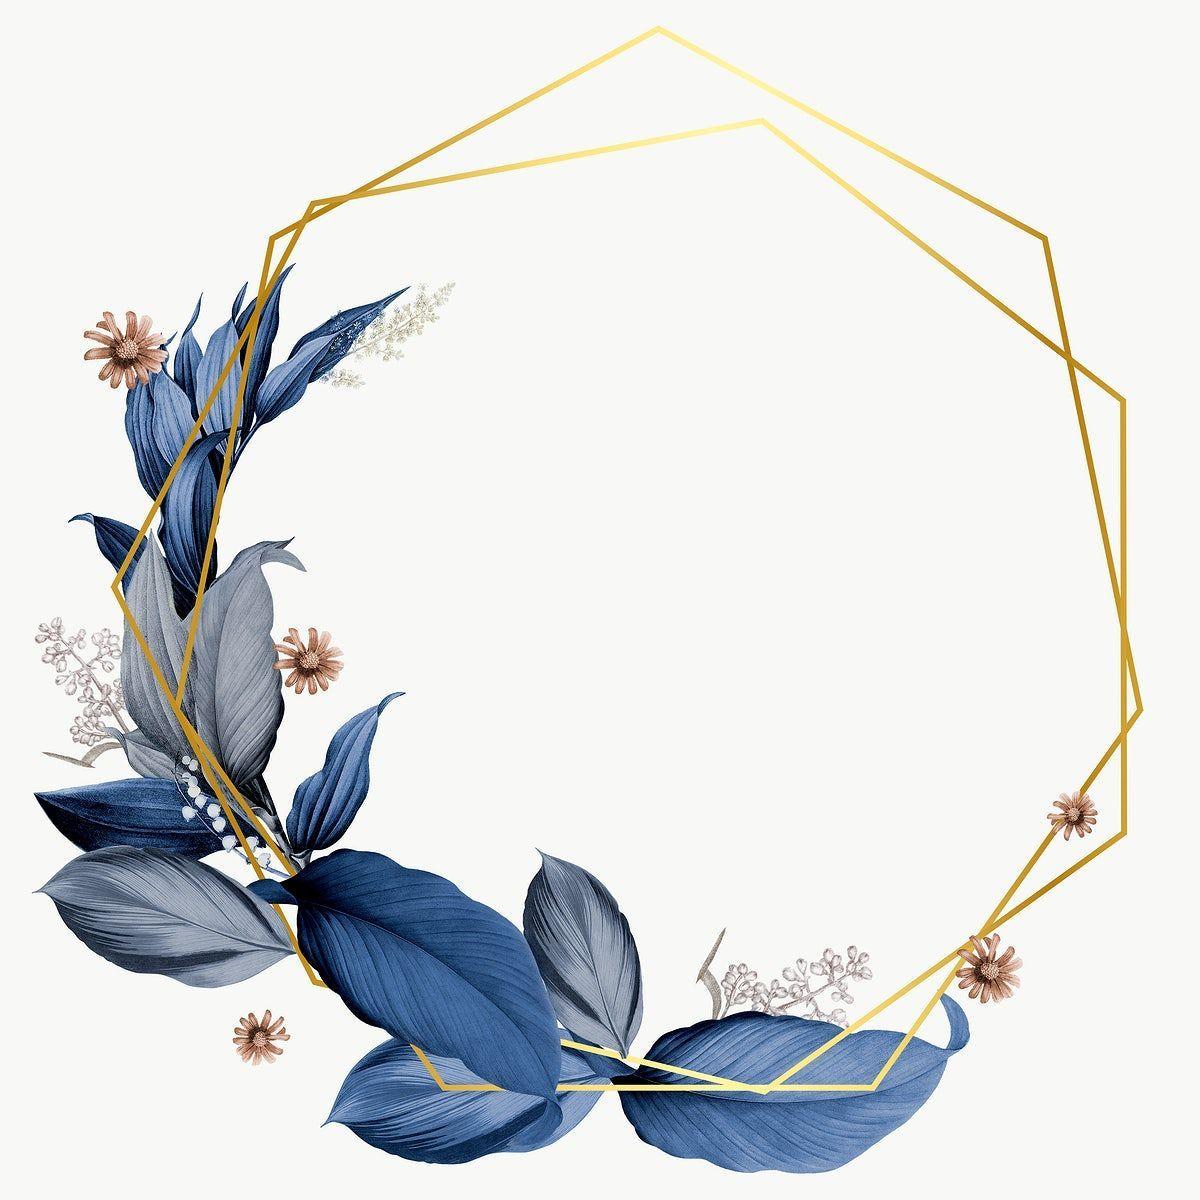 Blue Leaves With Golden Hexagon Frame Design Element 953